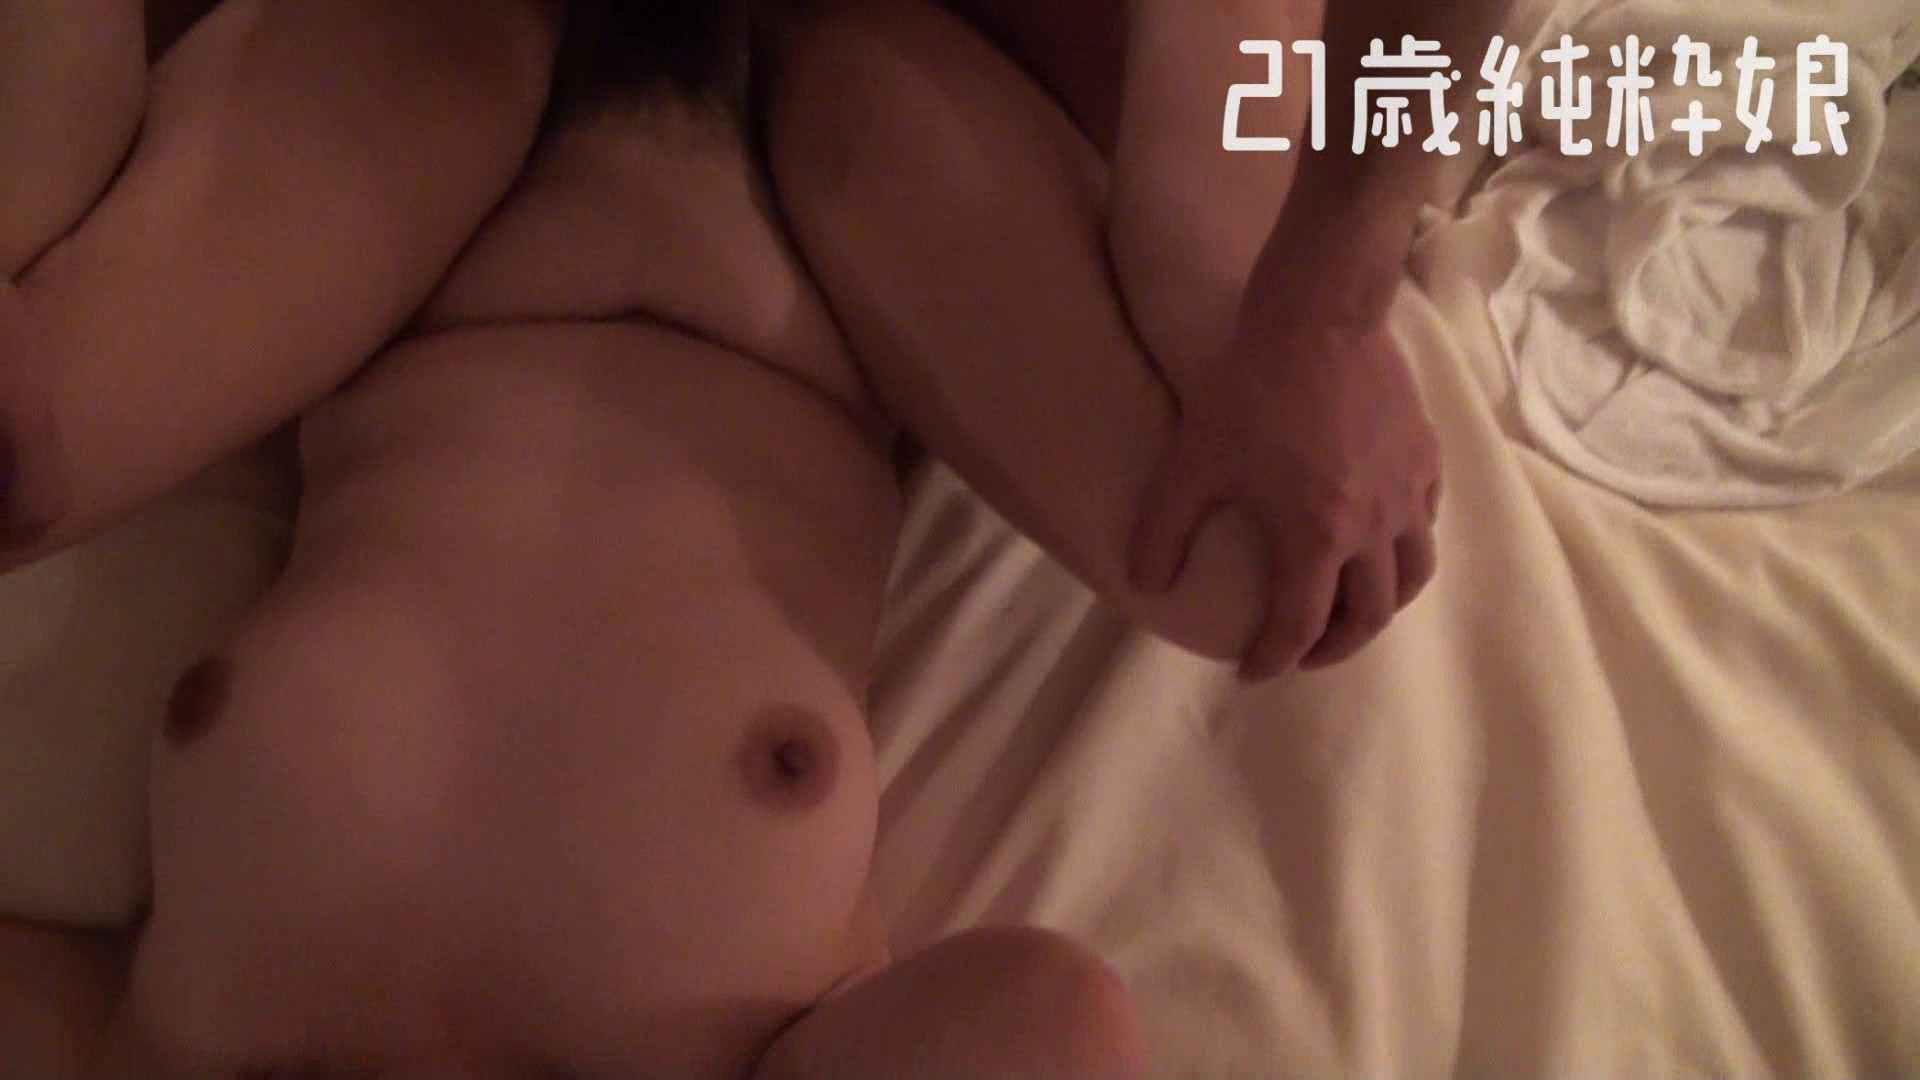 Gカップ21歳純粋嬢第2弾Vol.4 OL裸体 | 学校  65画像 42